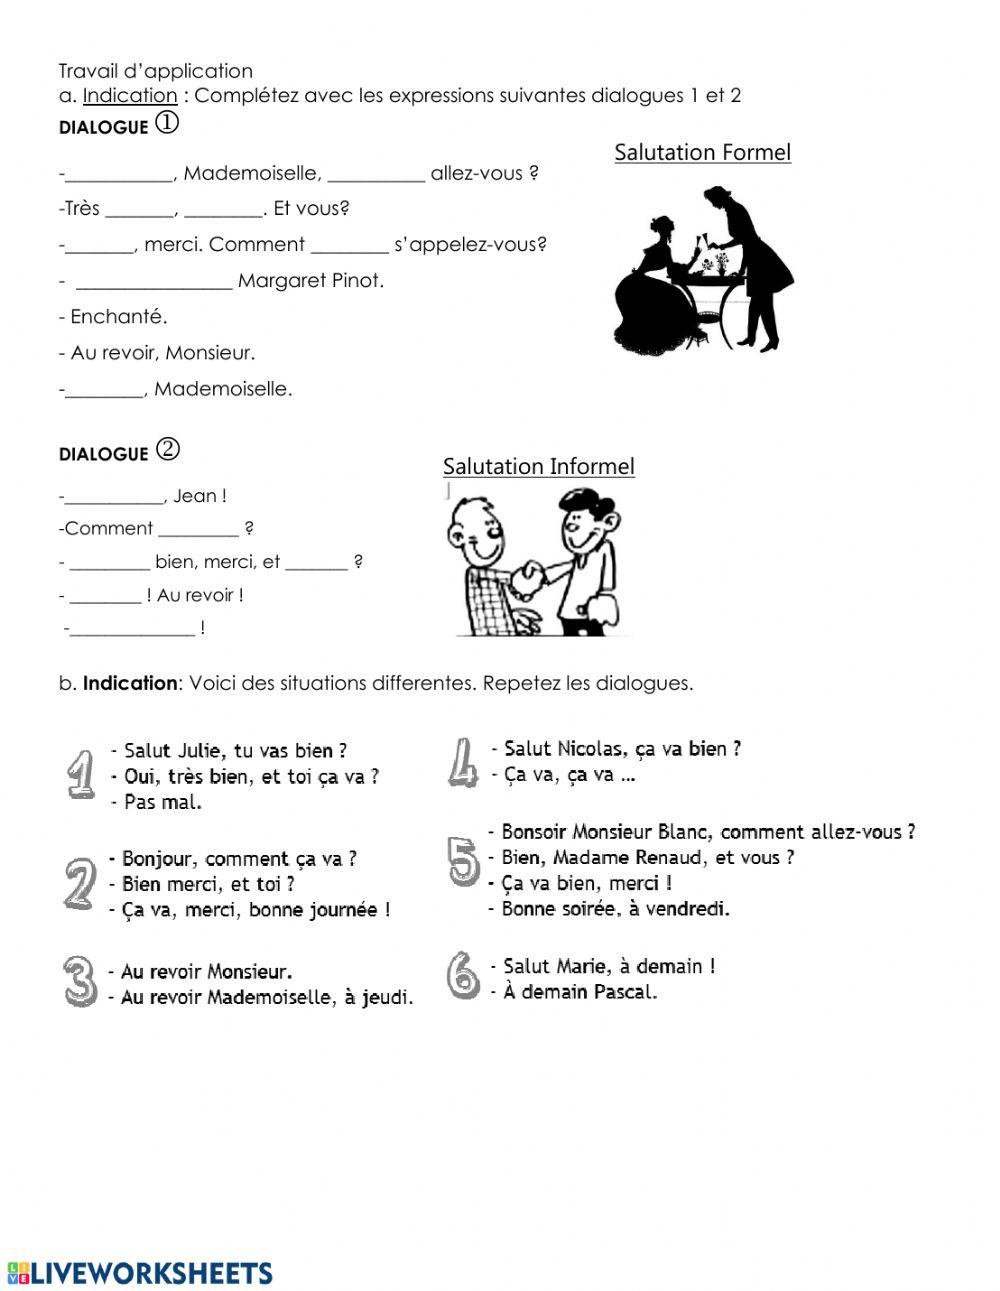 Les Salutations Interactive Worksheet concernant Bonjour Monsieur Comment Ca Va